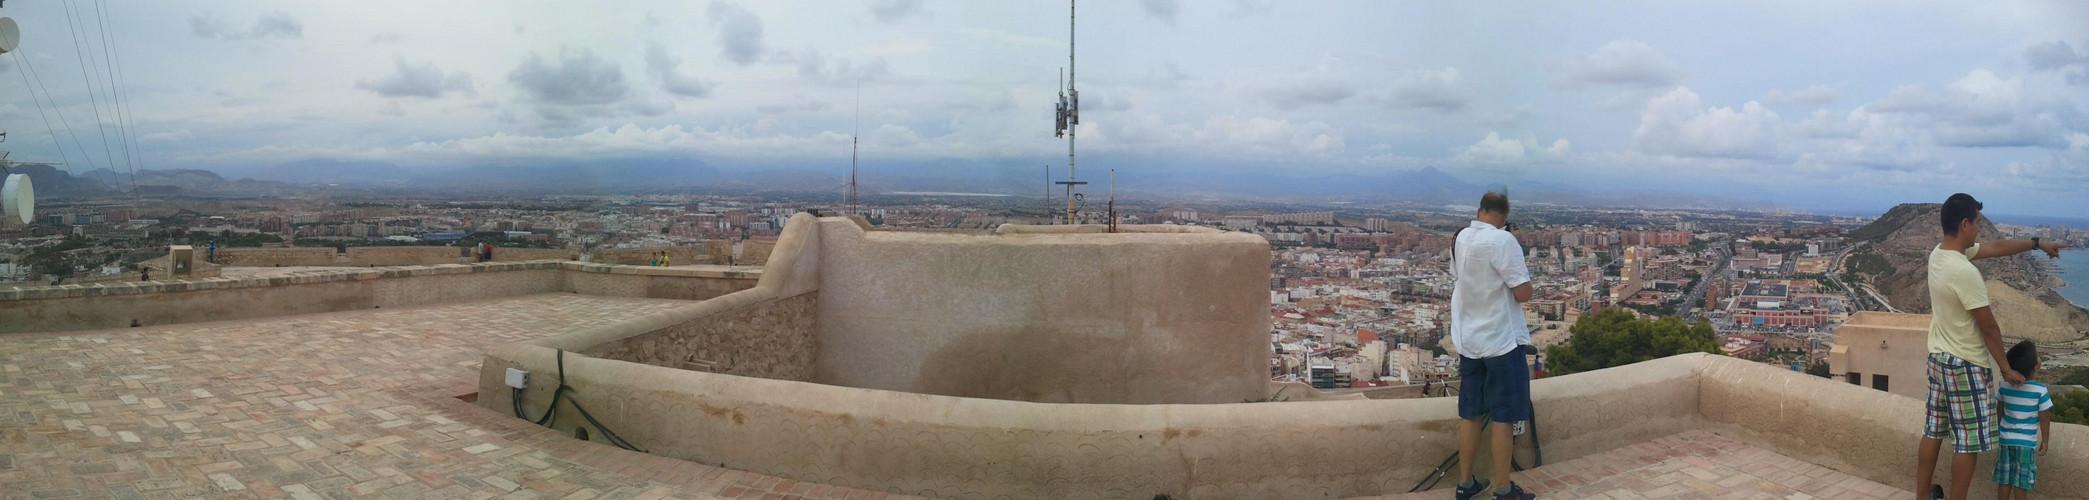 Panorama Alacant/ Alicante Part 2